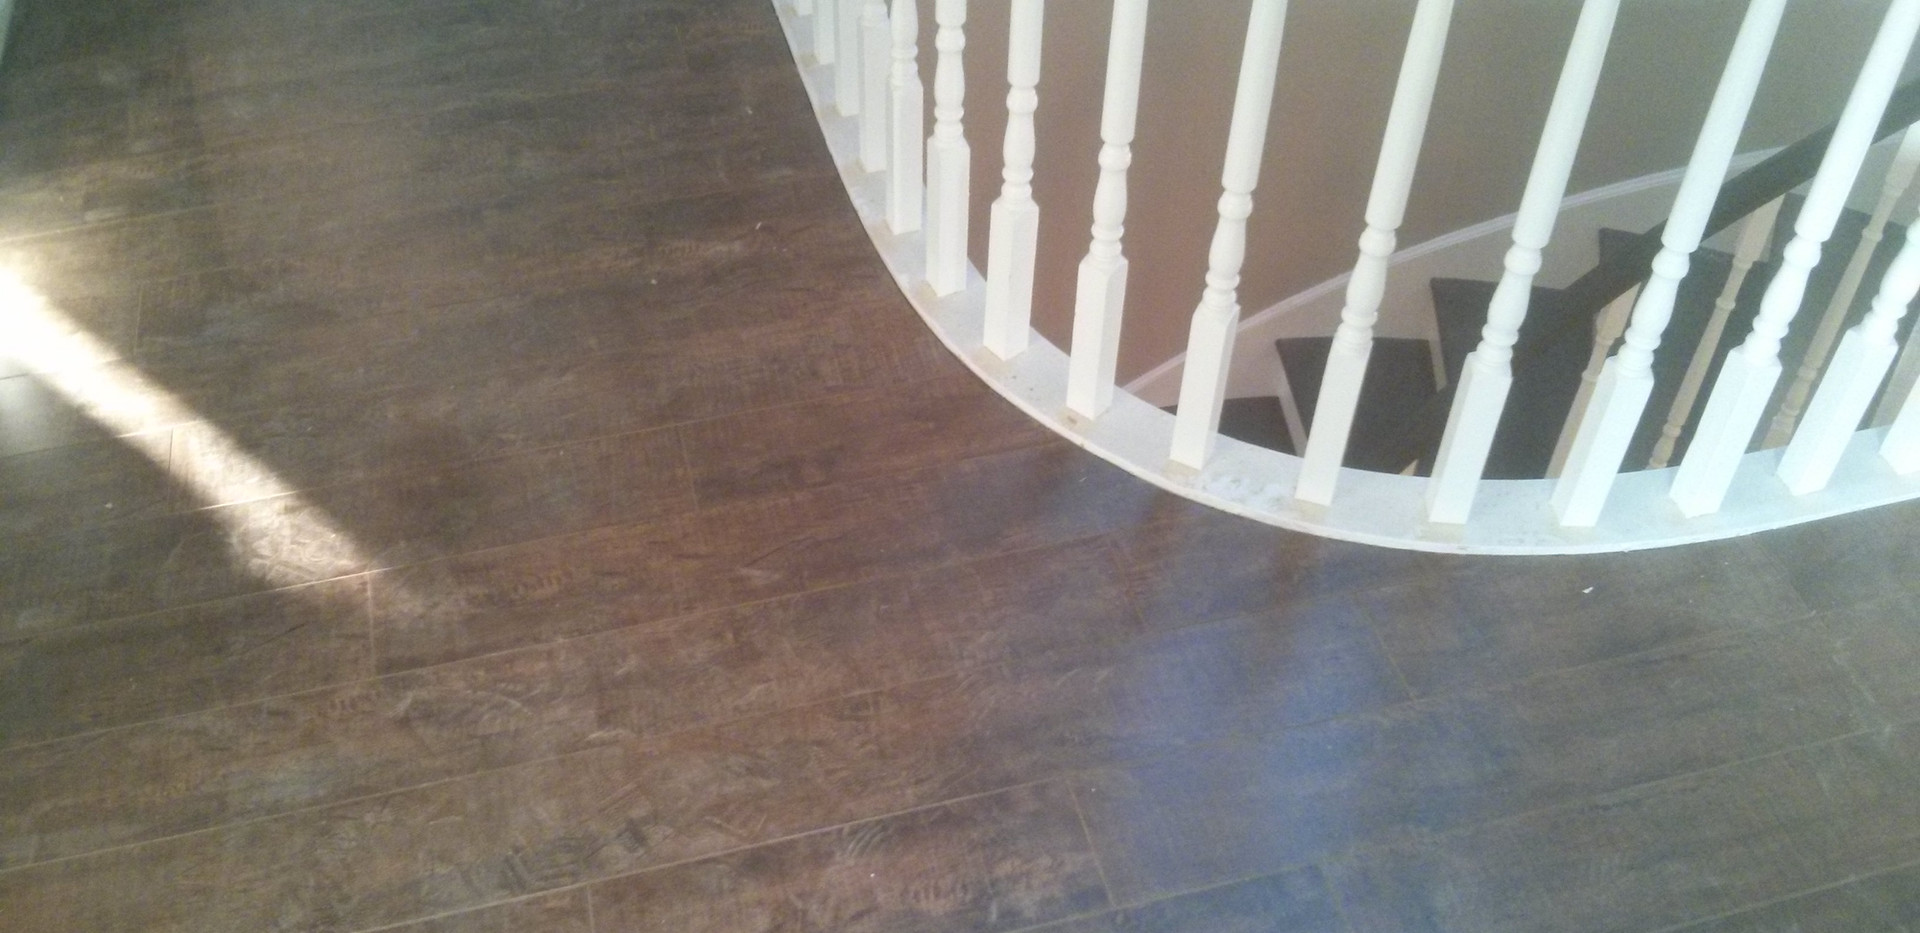 Laminate Flooring Curved Nosing Cut